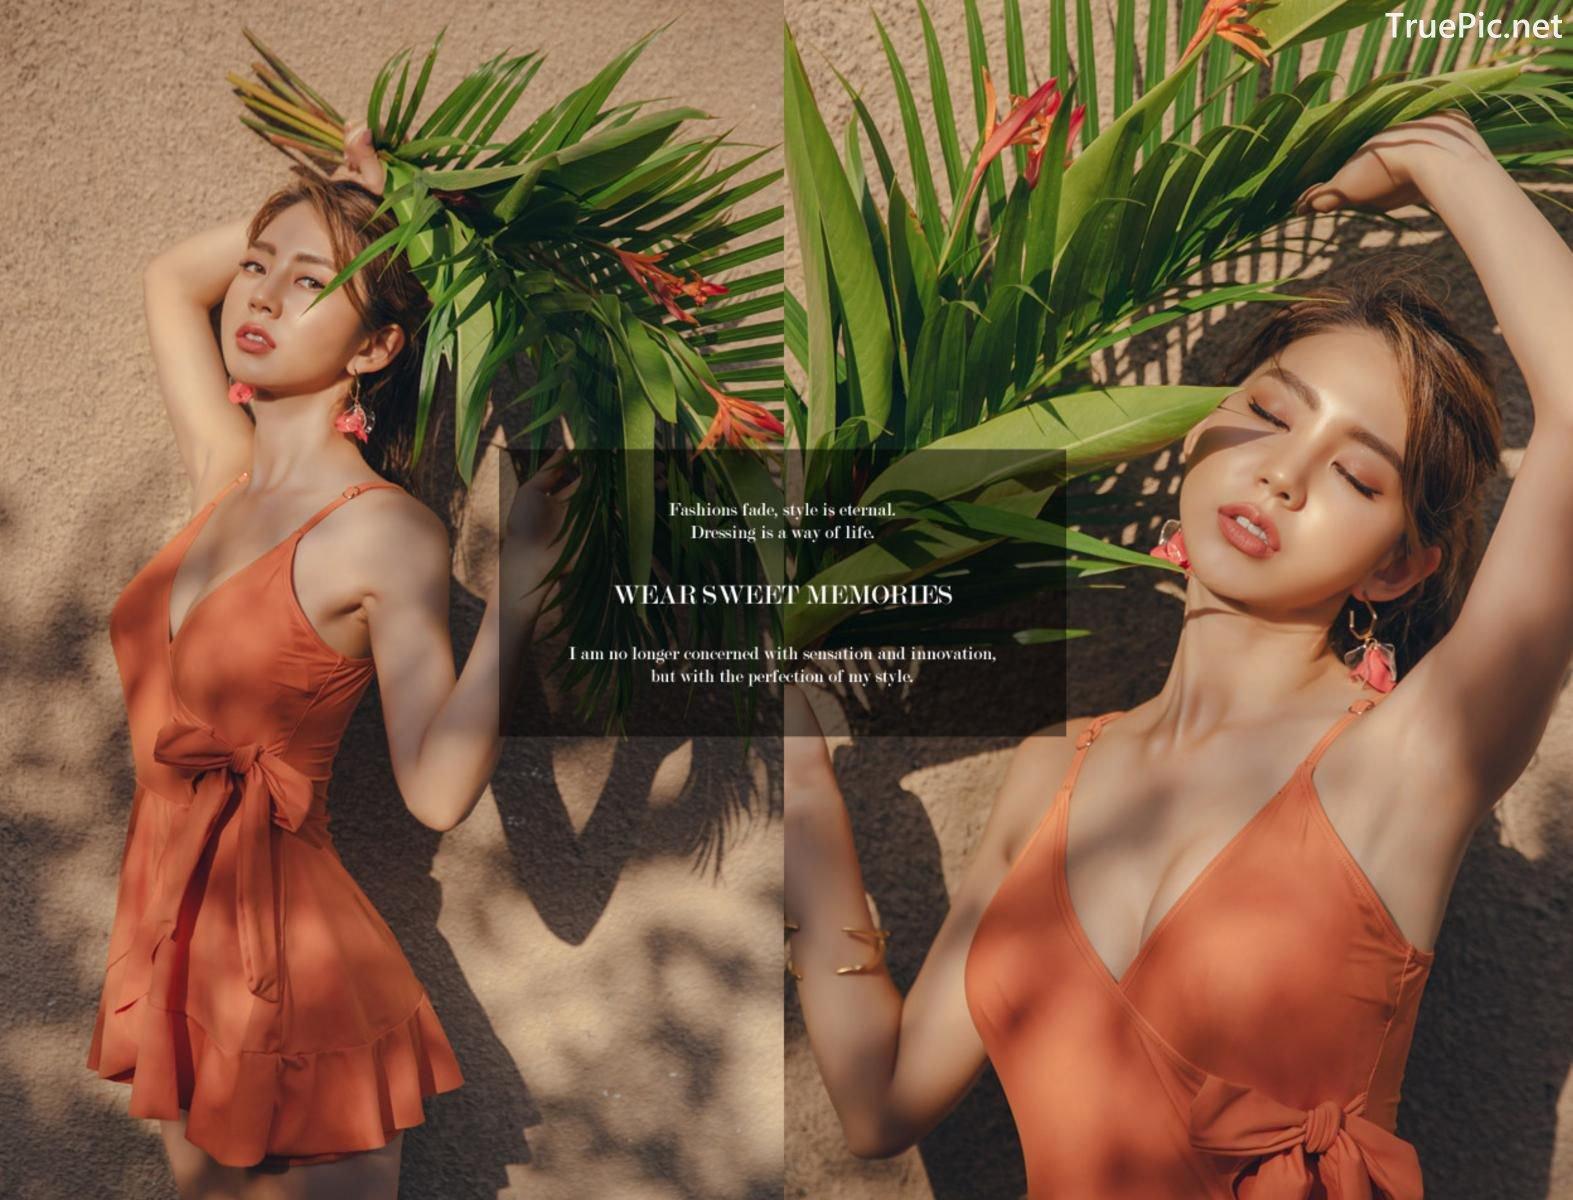 Image Korean Fashion Model - Lee Chae Eun - Sienna One Piece Swimsuit - TruePic.net - Picture-17